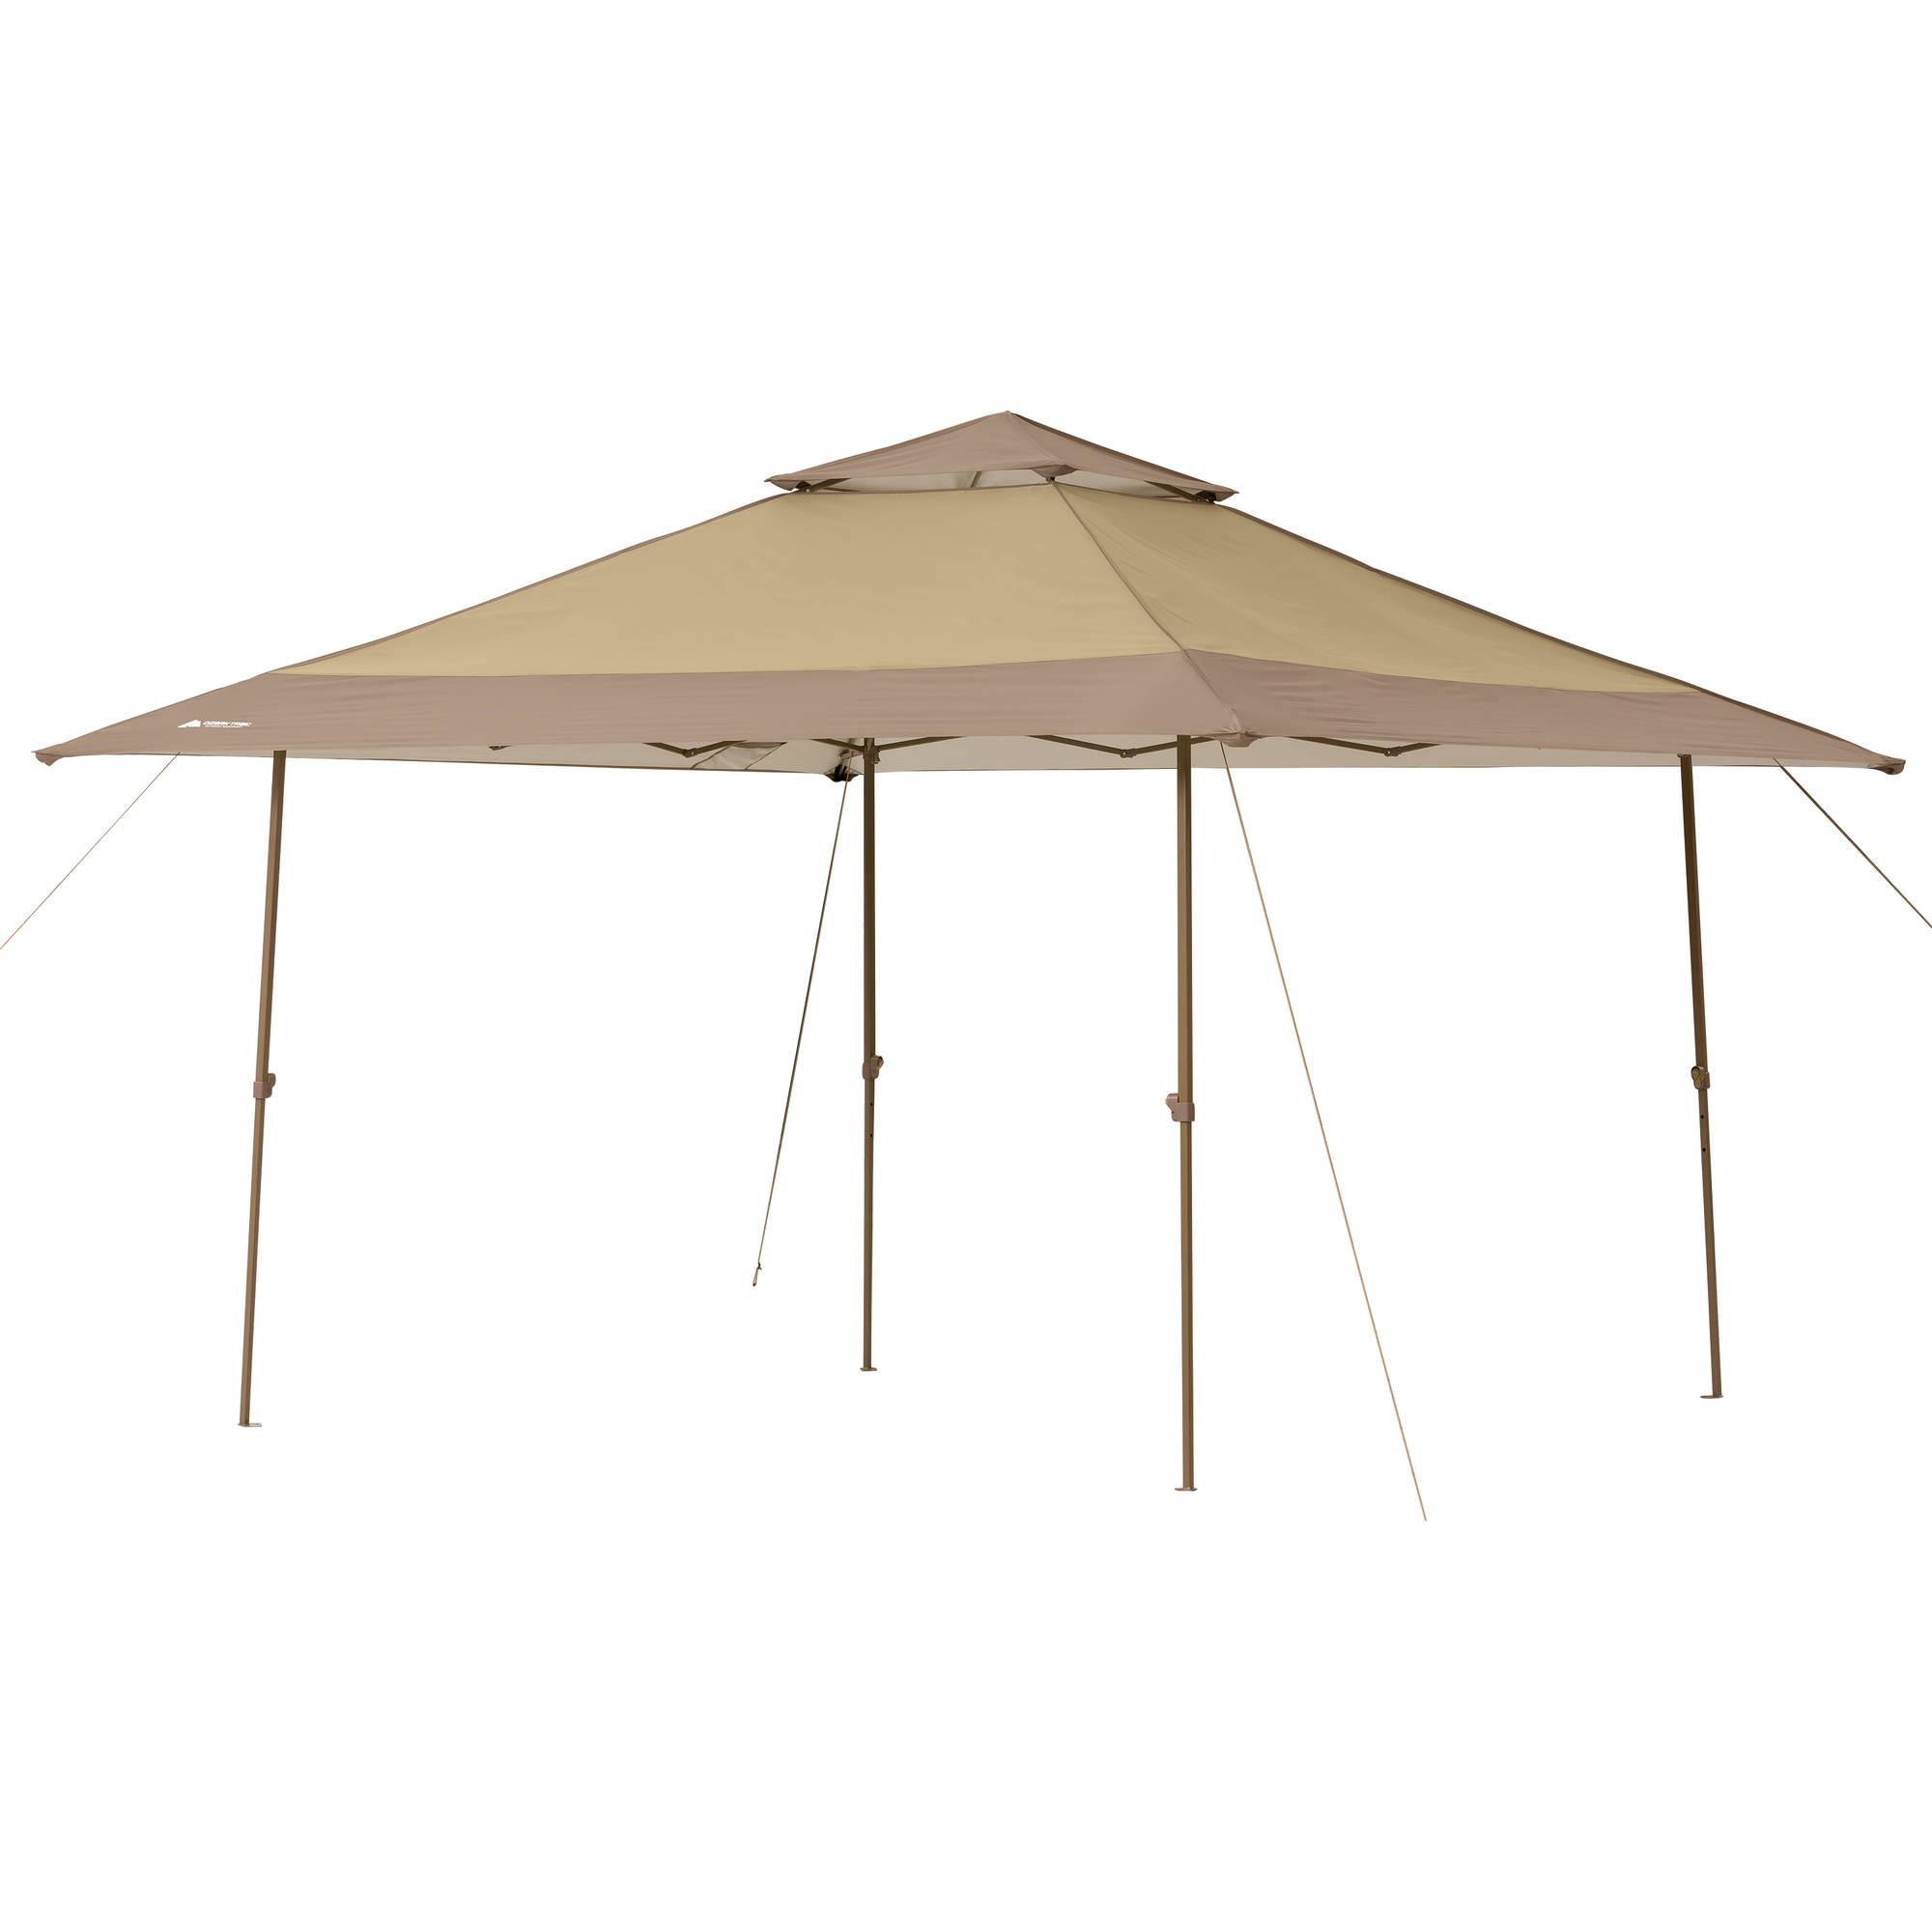 Deal Image  sc 1 st  Slickdeals & Select Walmart Stores: Ozark Trail 13u0027x13u0027 Instant Canopy ...